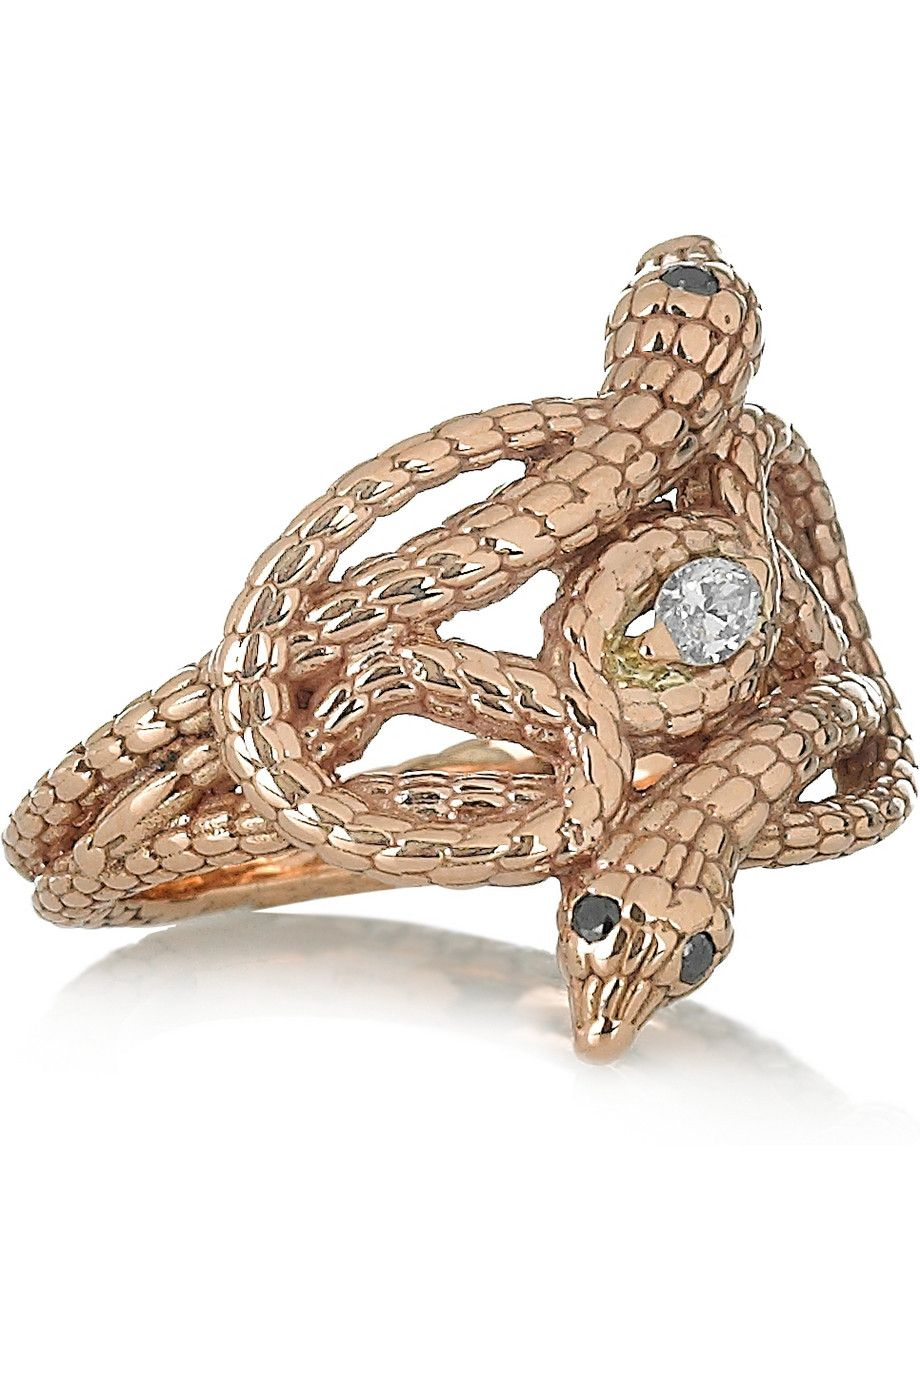 Ileana makri snake nest karat rose gold diamond ring neta